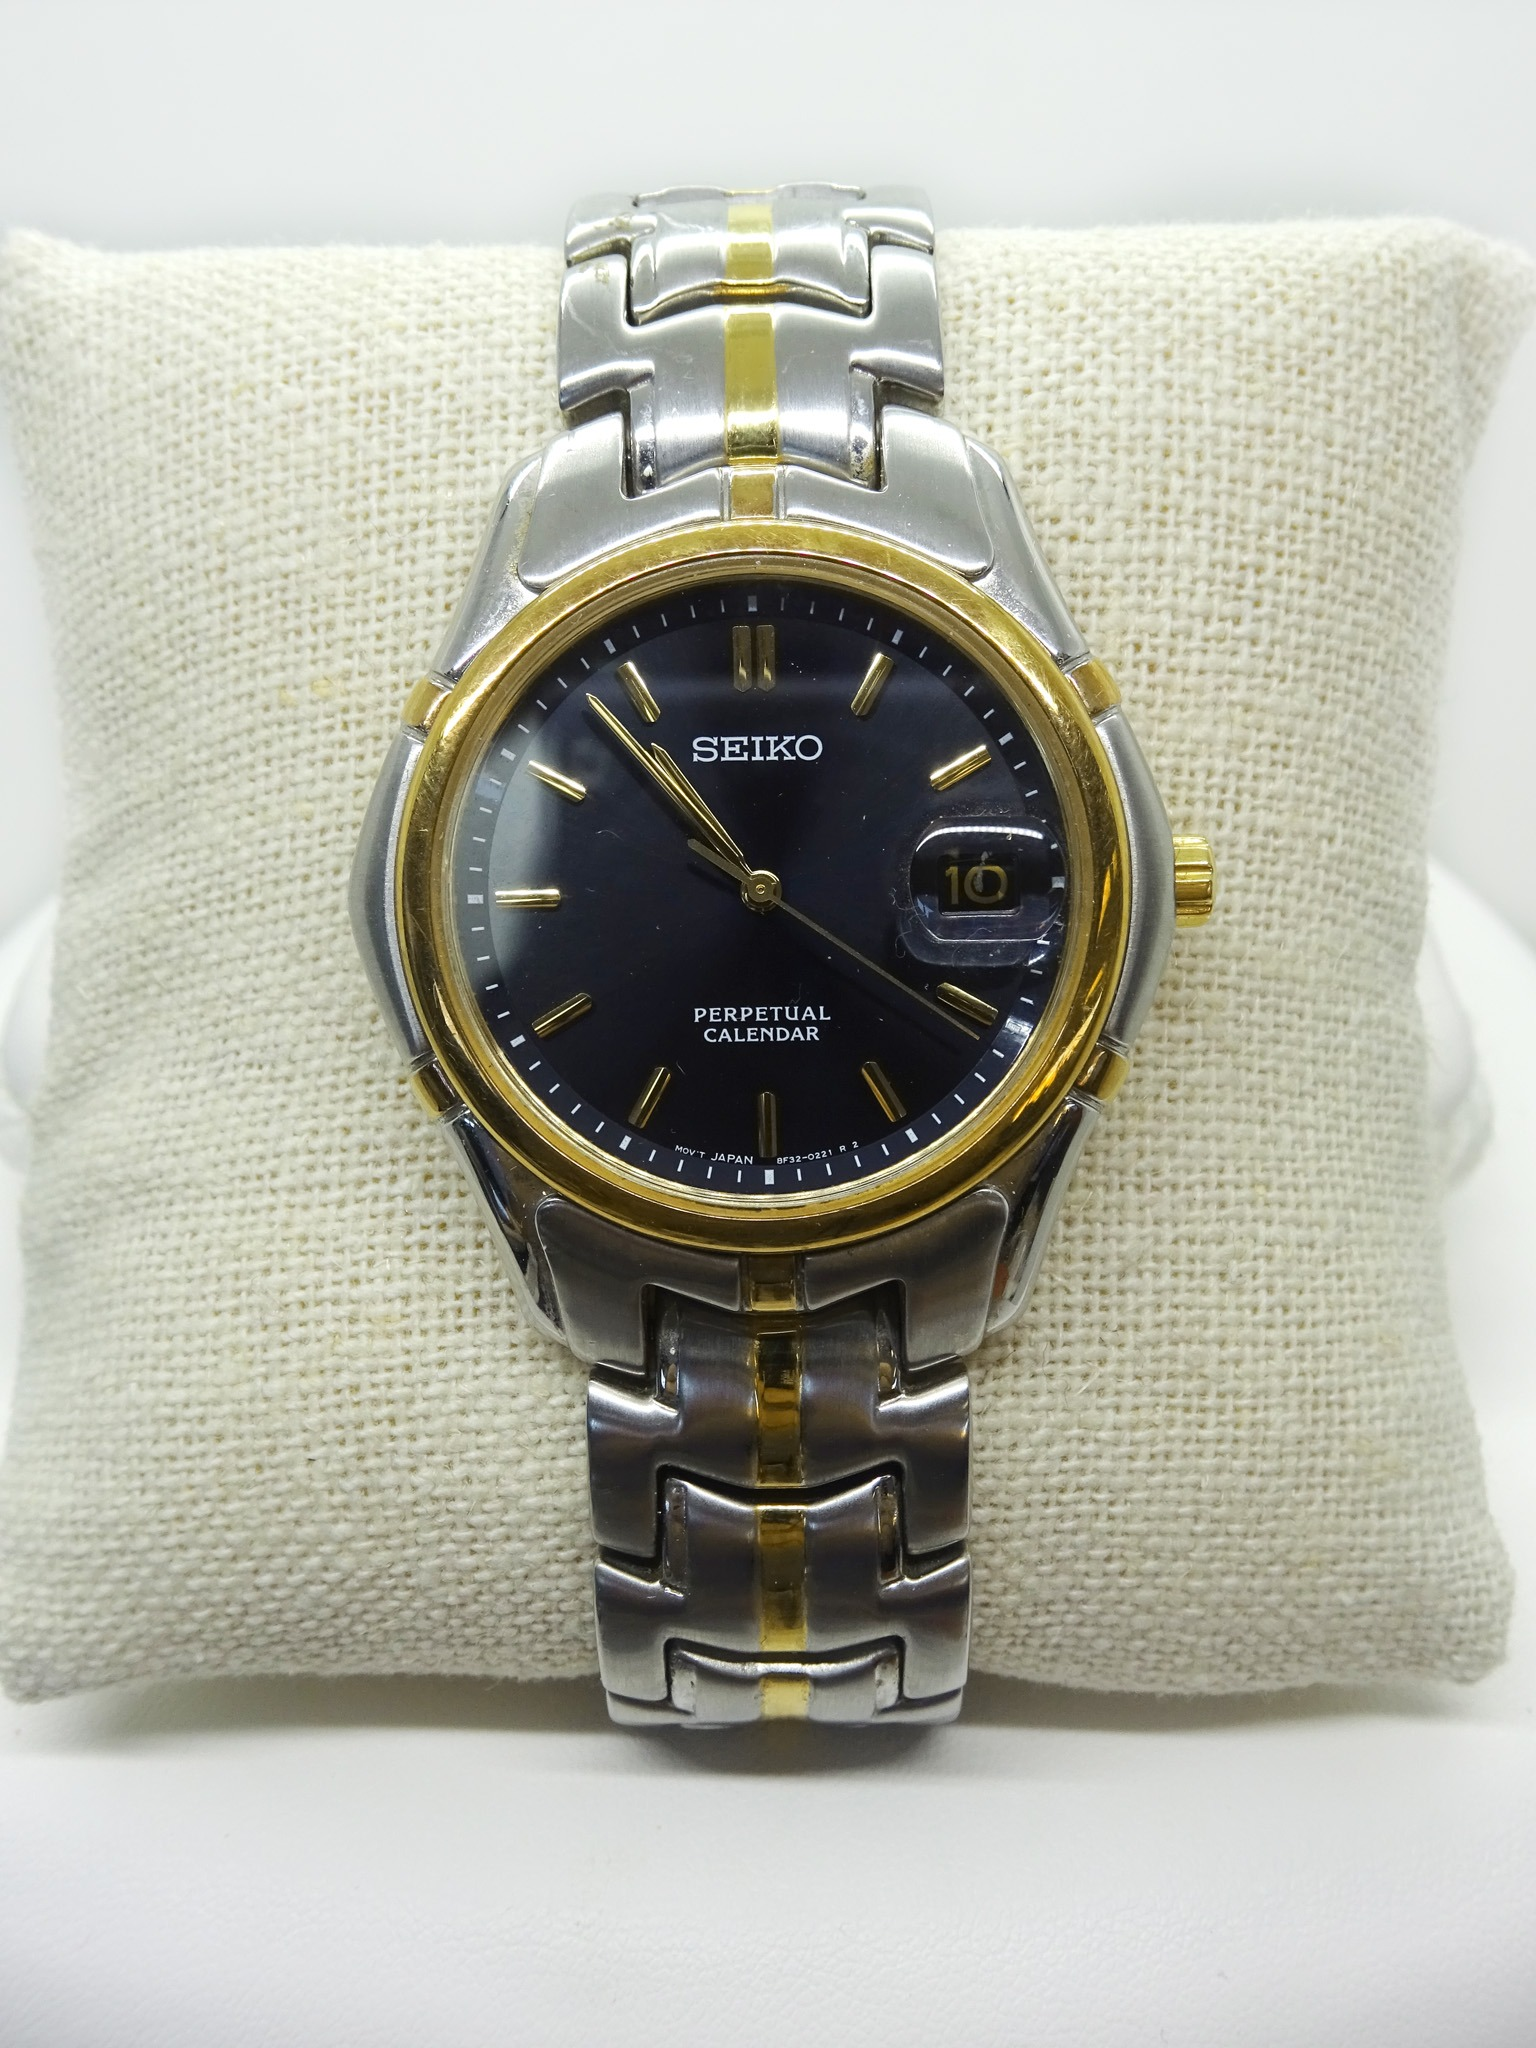 Seiko Perpetual Calendar Two-Tone Men's Watch 8F32-0189